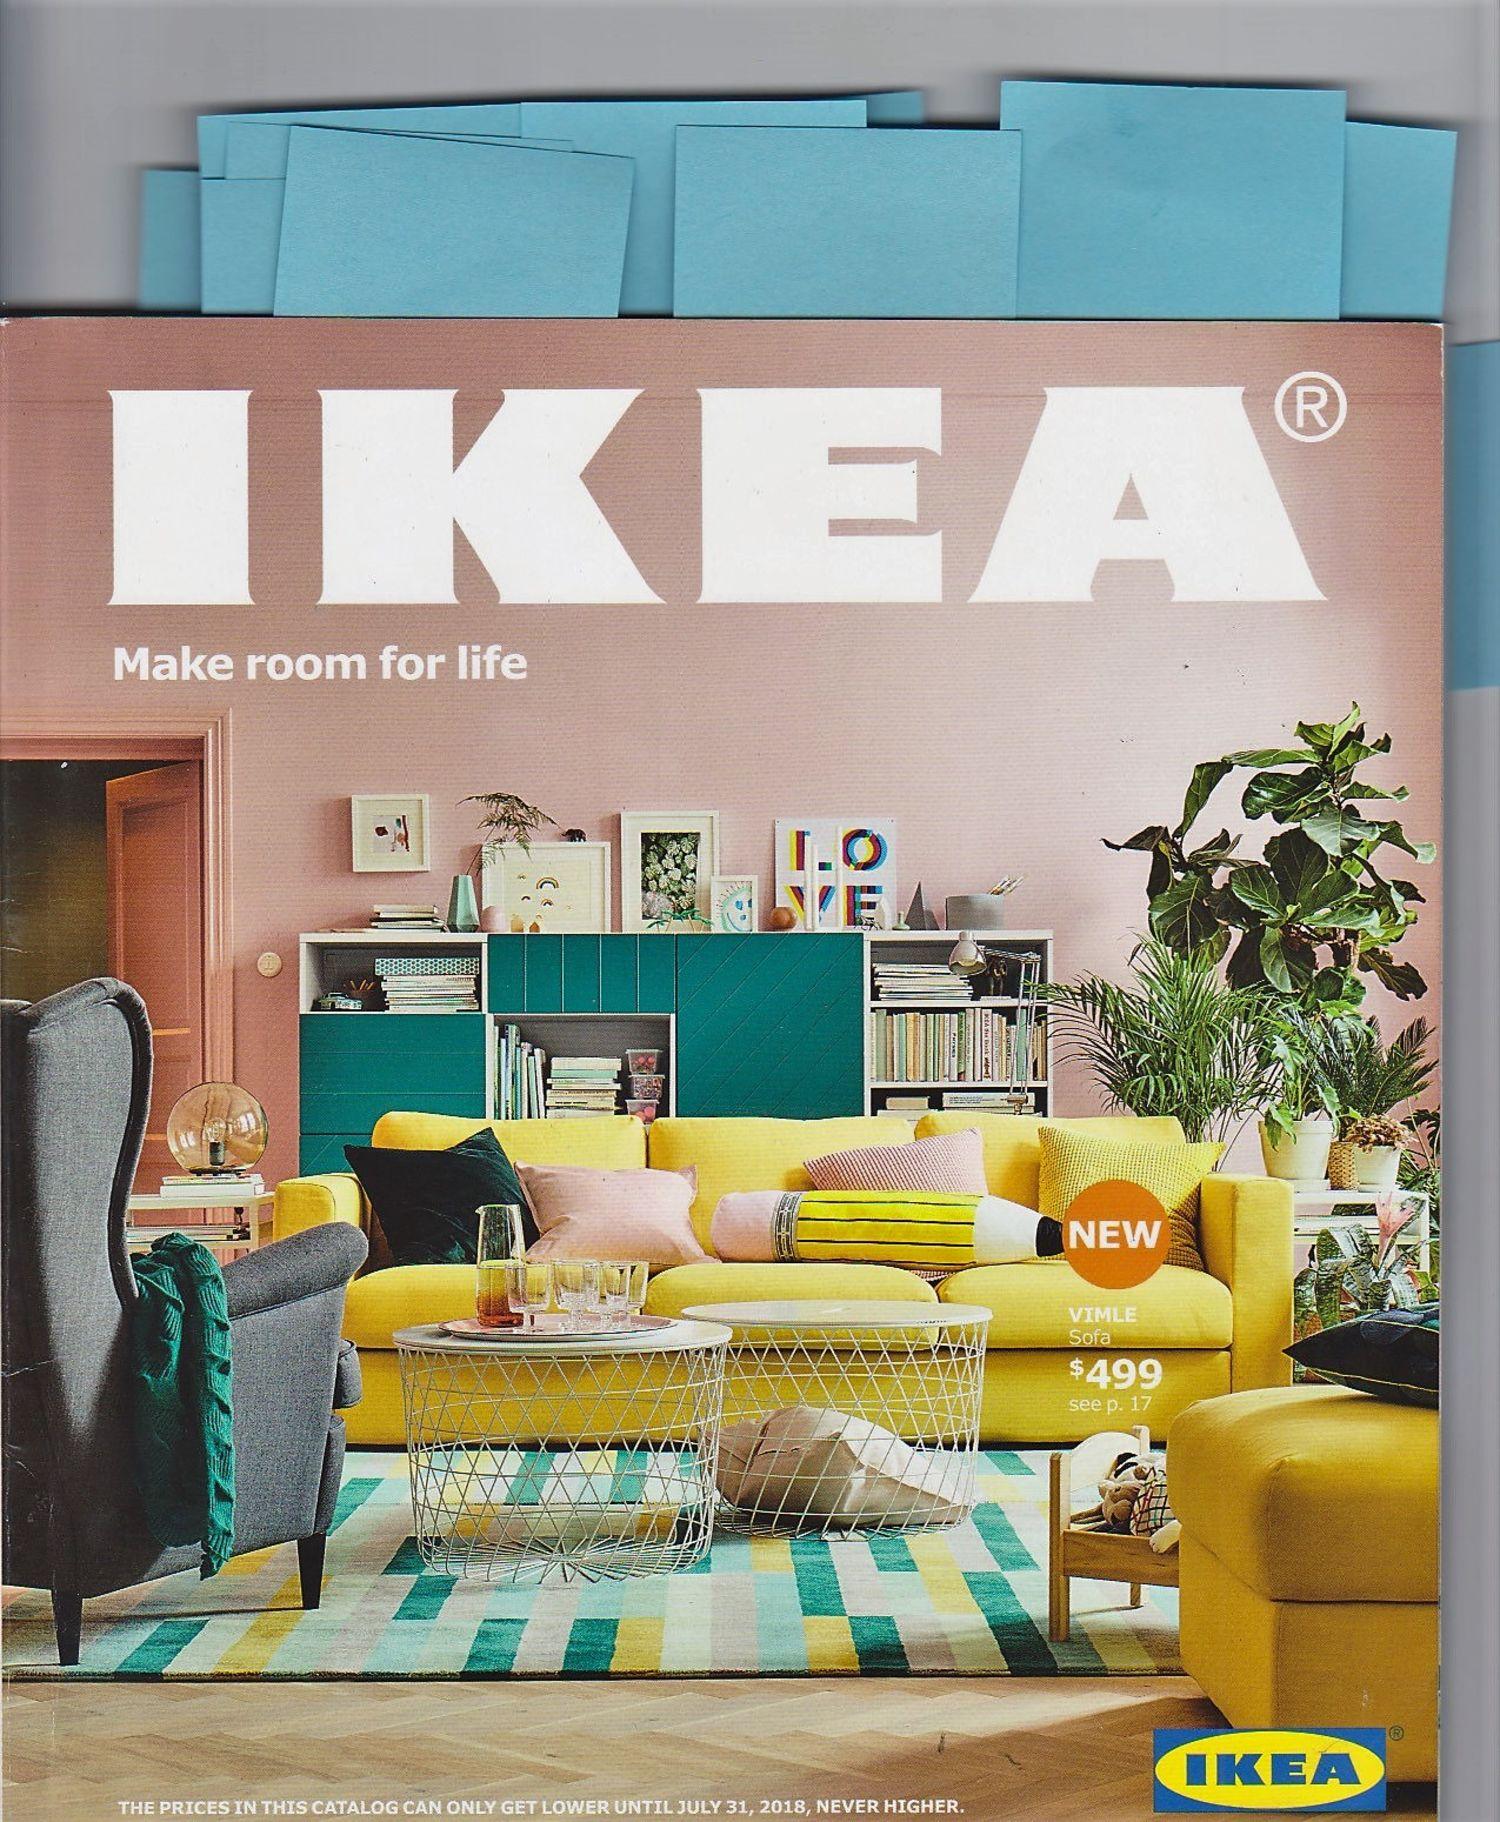 new ikea 2018 catalog top 10 new products sneak peek. Black Bedroom Furniture Sets. Home Design Ideas